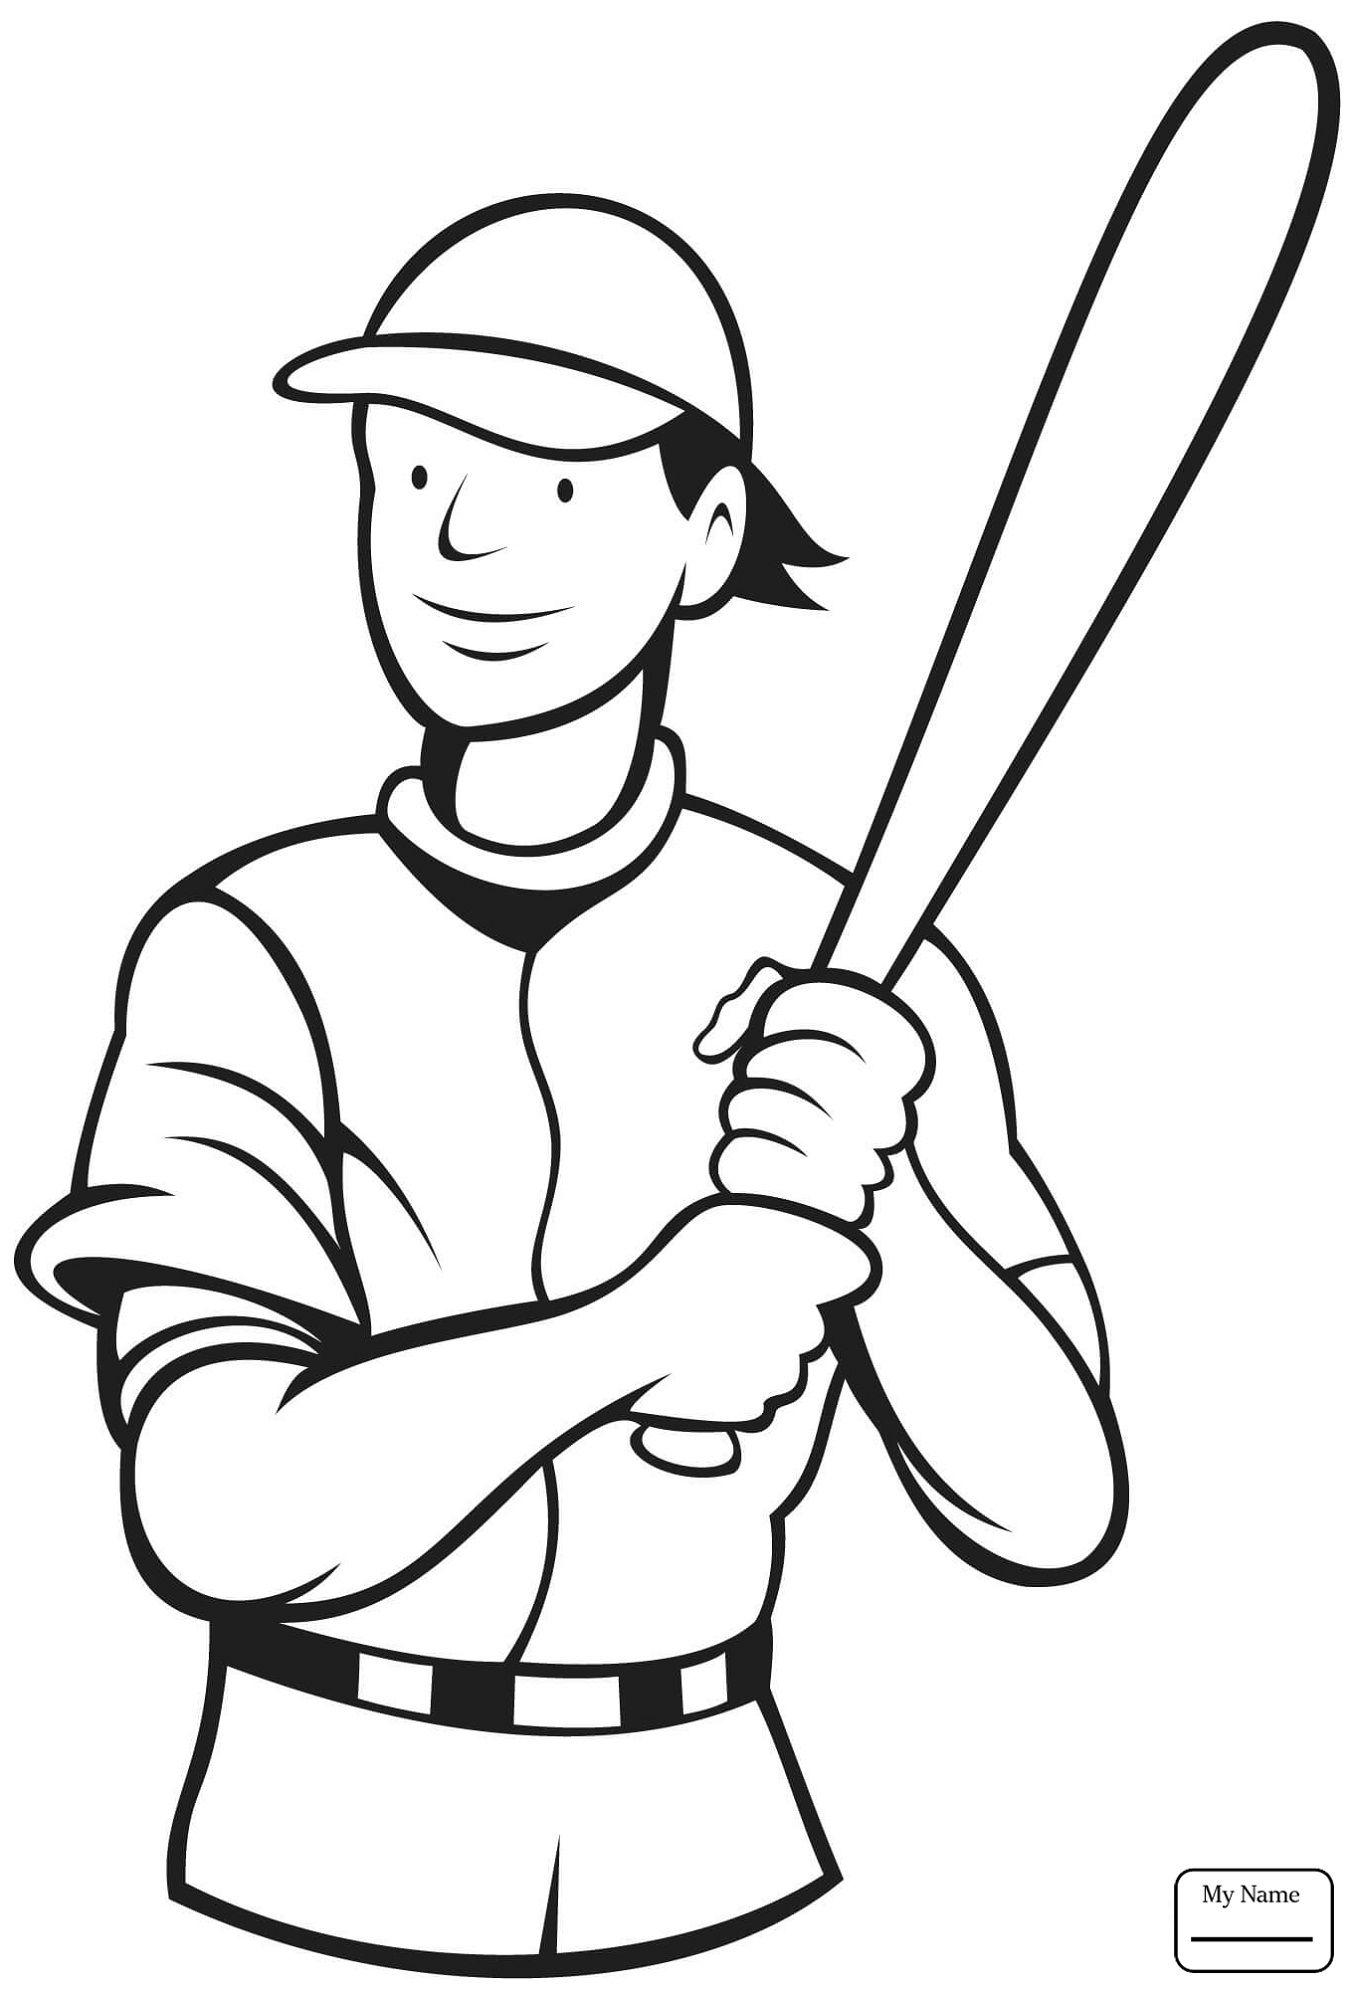 Jackie Robinson Coloring Page Cartoon Sports Coloring Pages Baseball Coloring Pages Coloring Pages